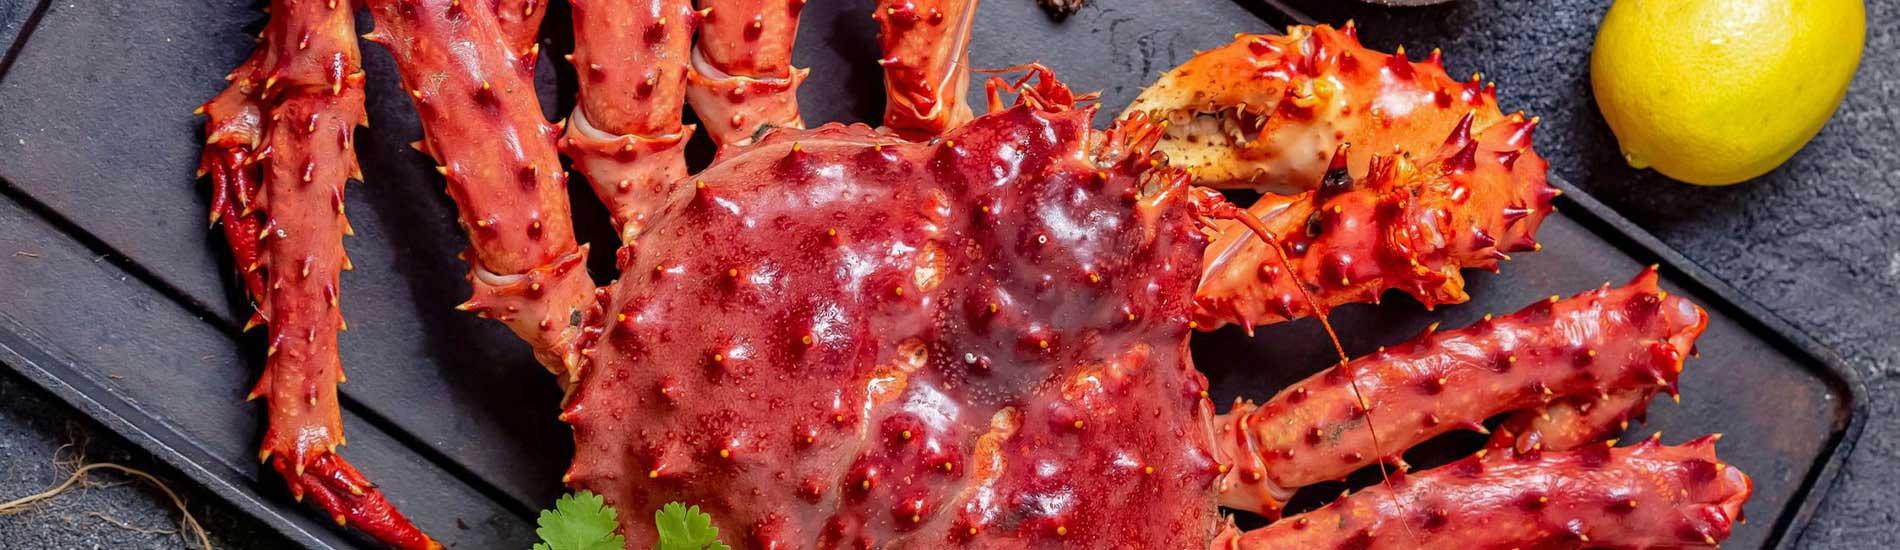 Ushuaia帝王蟹